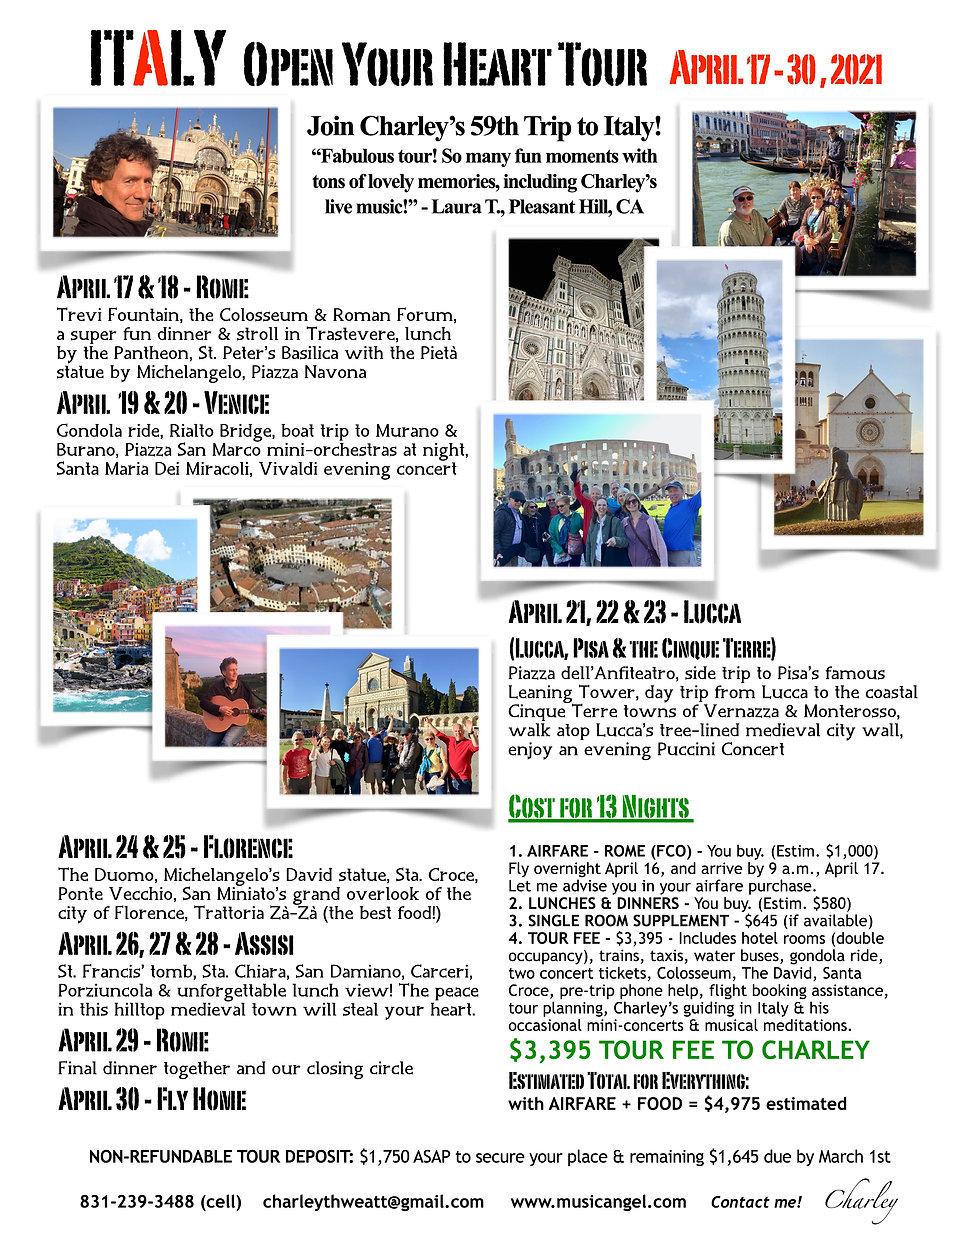 Italy 13 Day April 2021 Tour Flyer.jpg